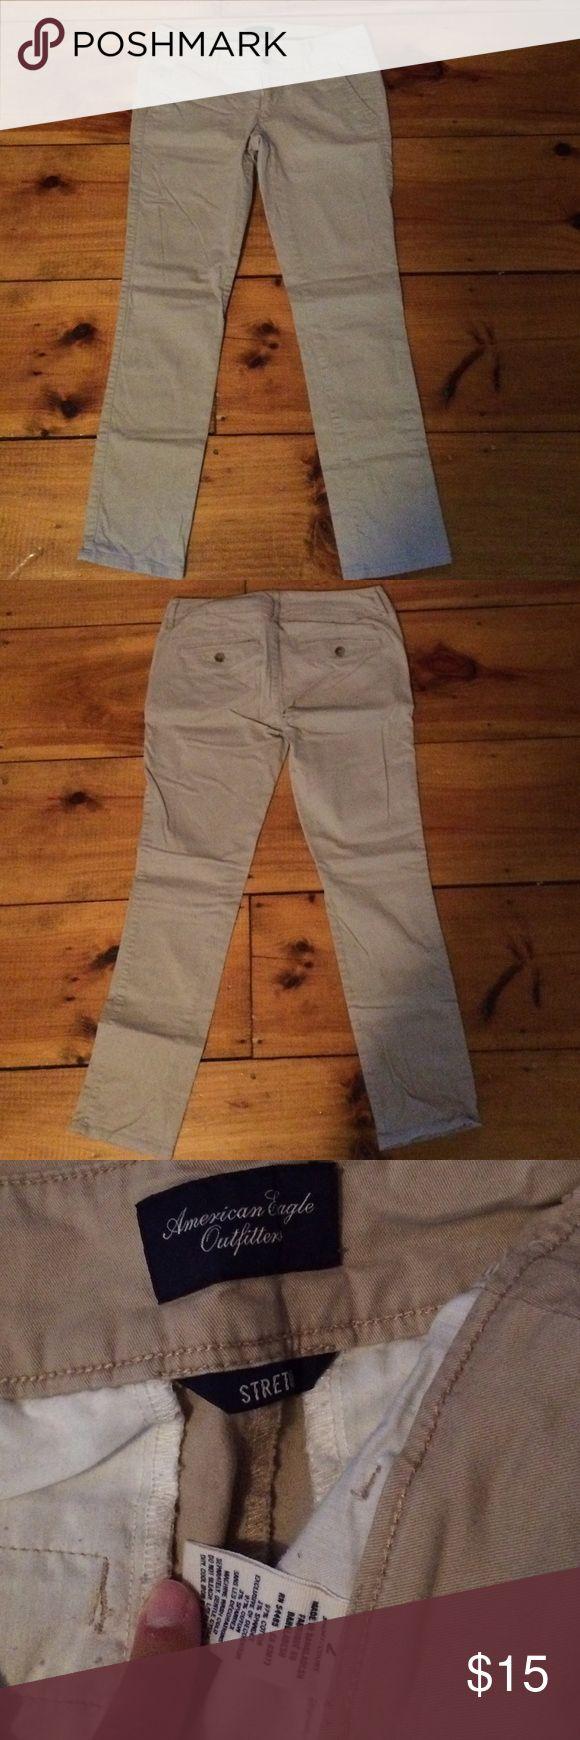 Khaki Trousers American Eagle khaki skinny trousers. Lightly worn. American Eagle Outfitters Pants Trousers